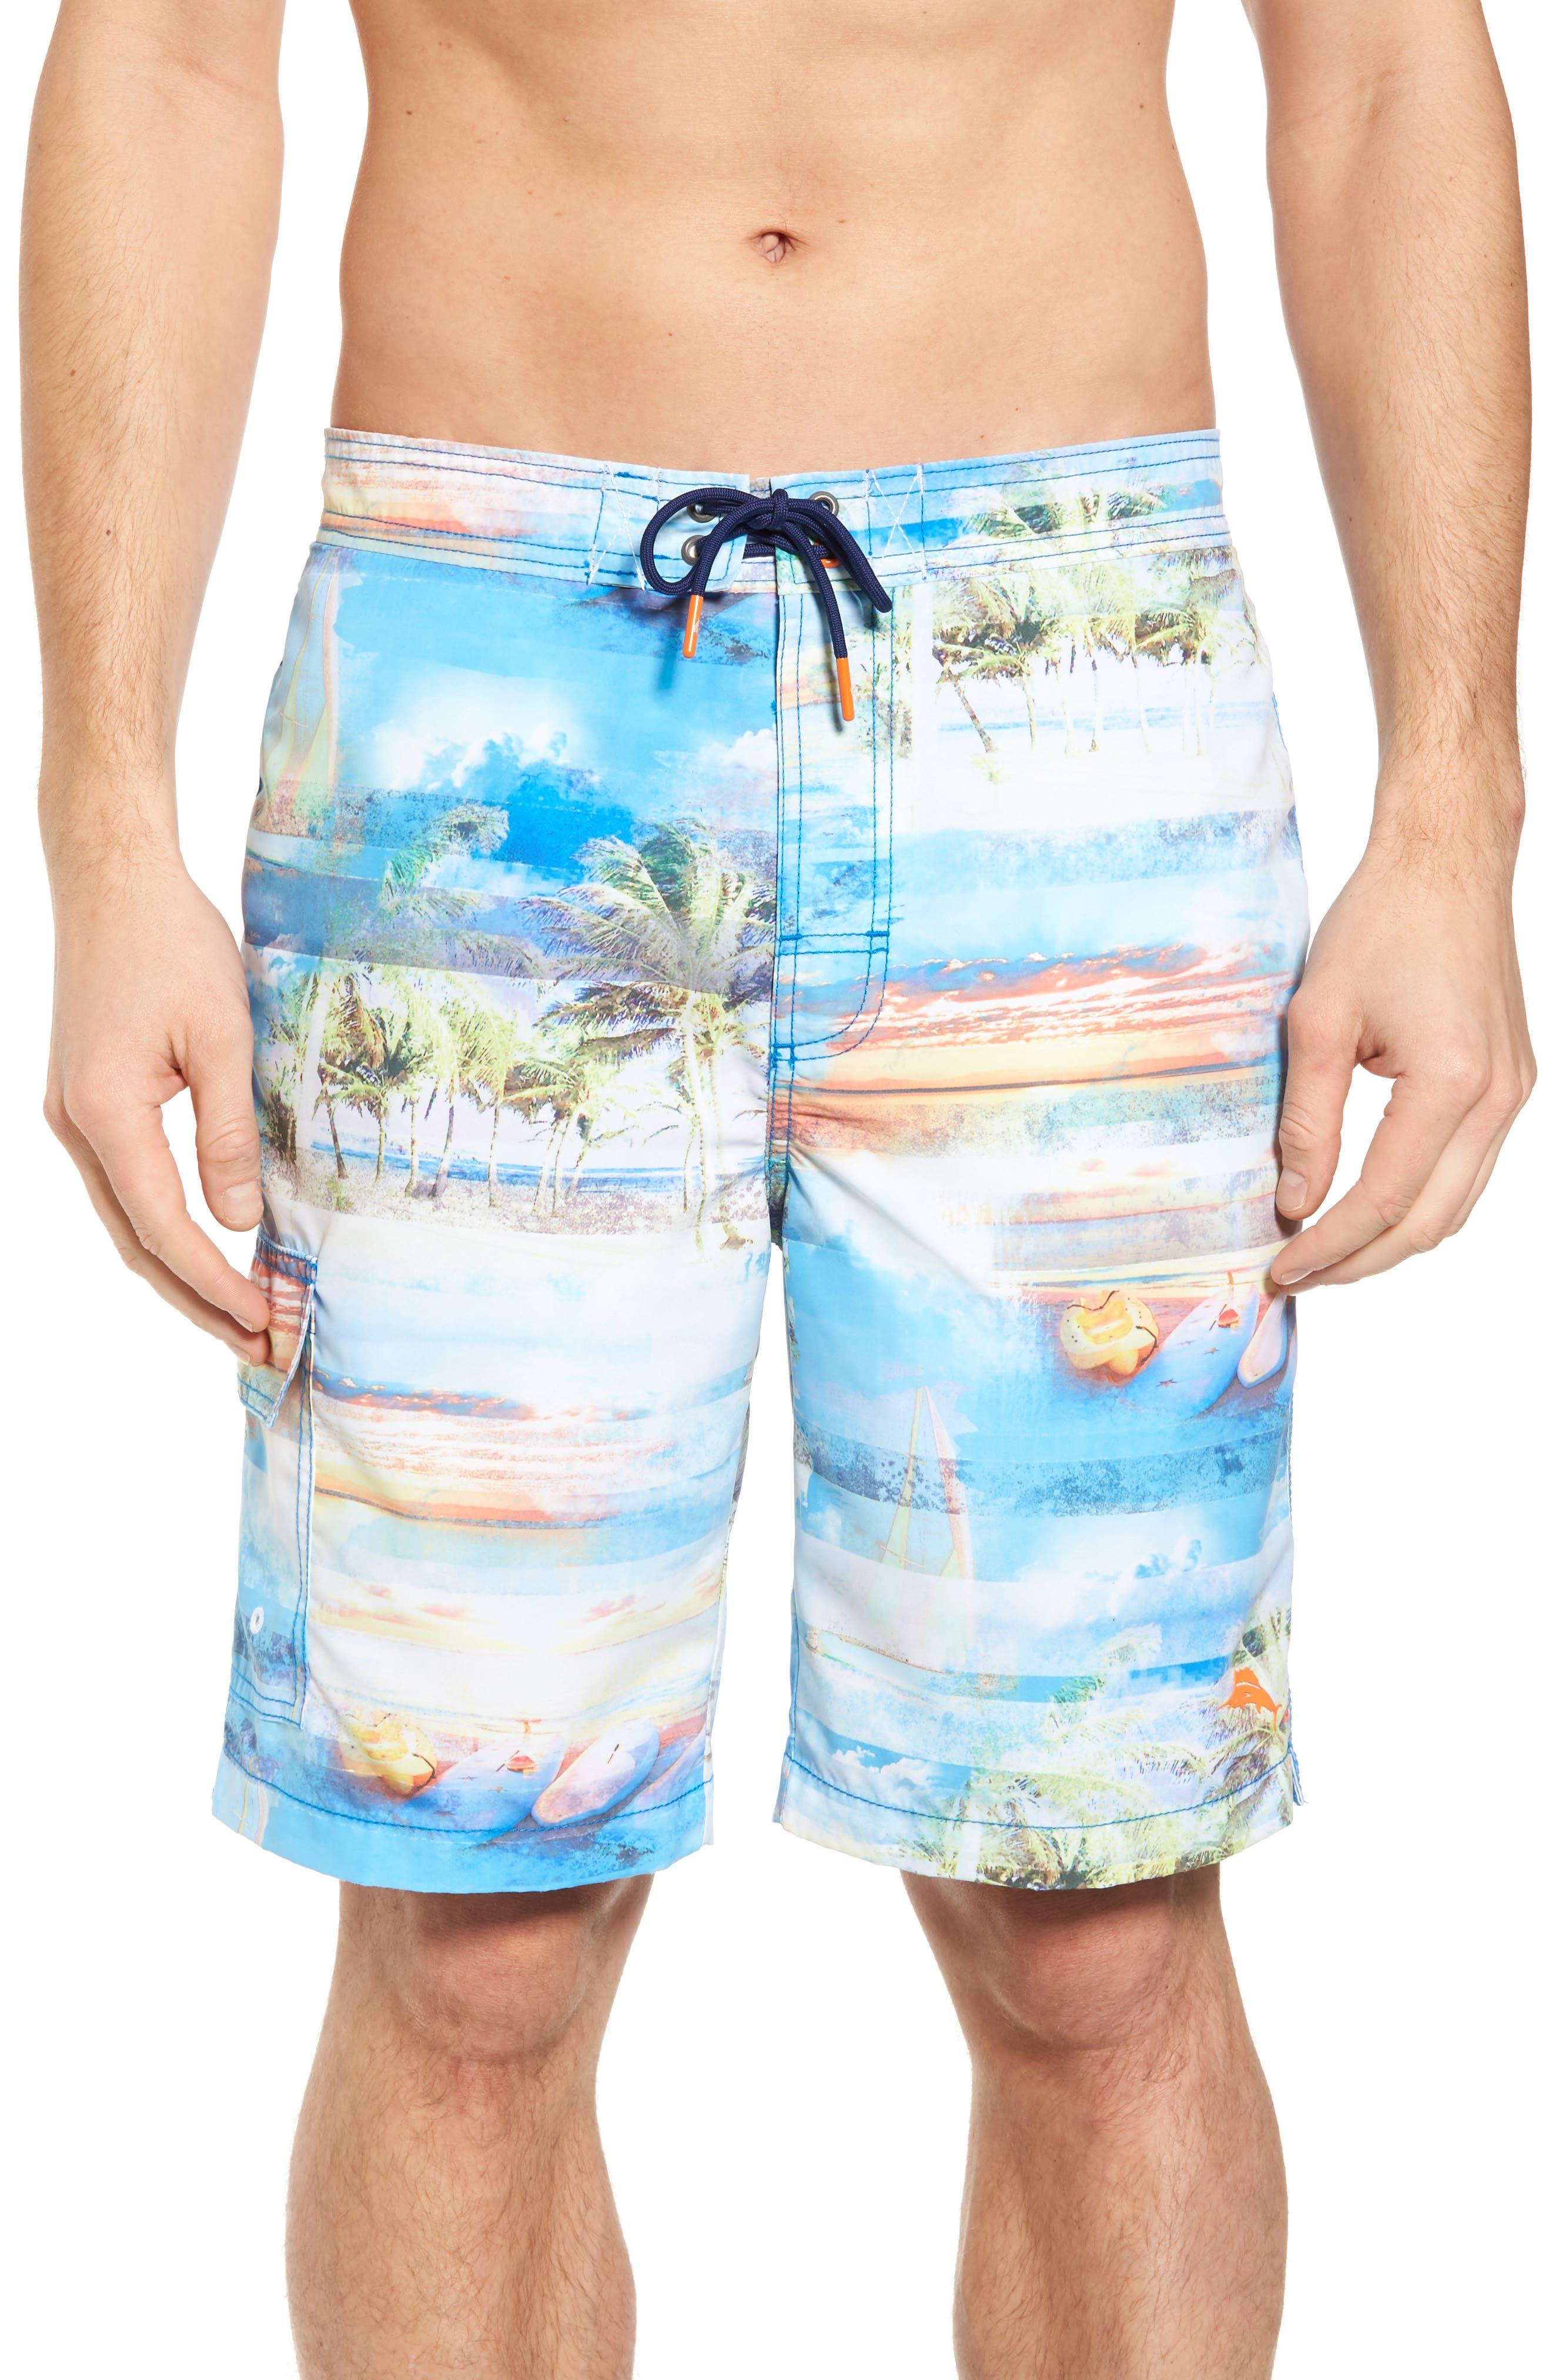 Alternate Image 1 Selected - Tommy Bahama Baja Electric Beach Swim Trunks